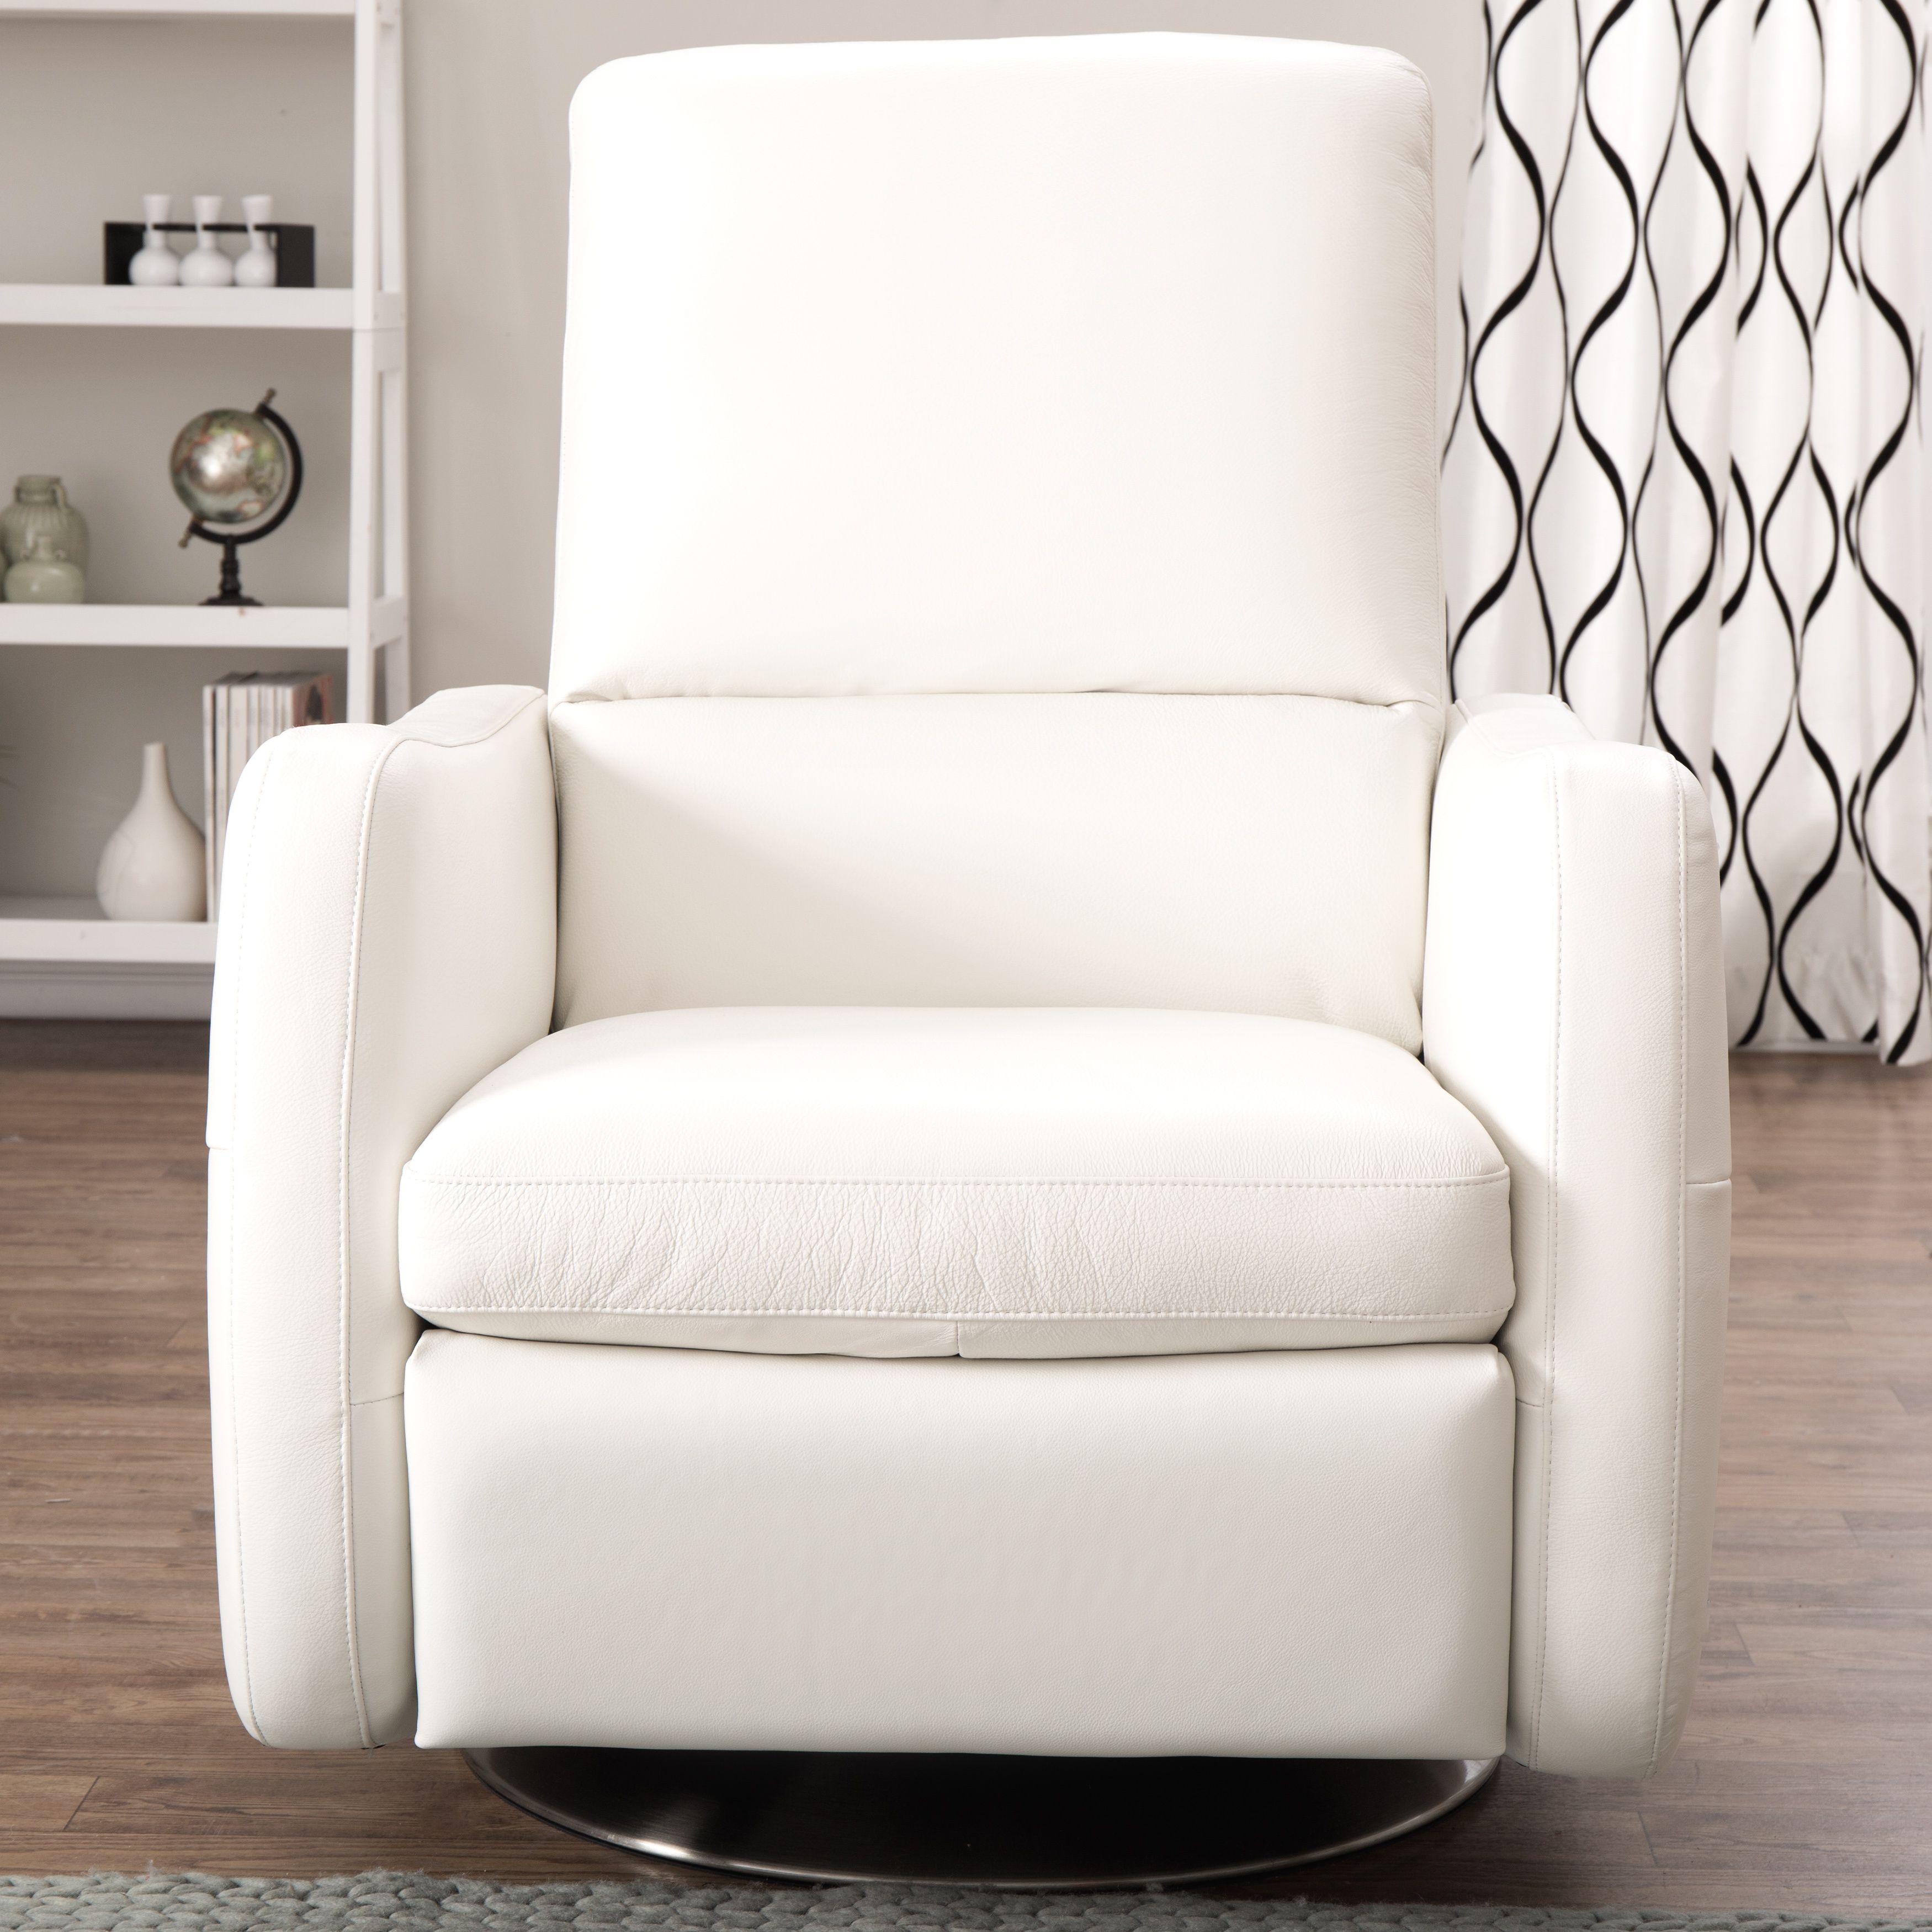 Living room chairs italian leather sofa leather sofa